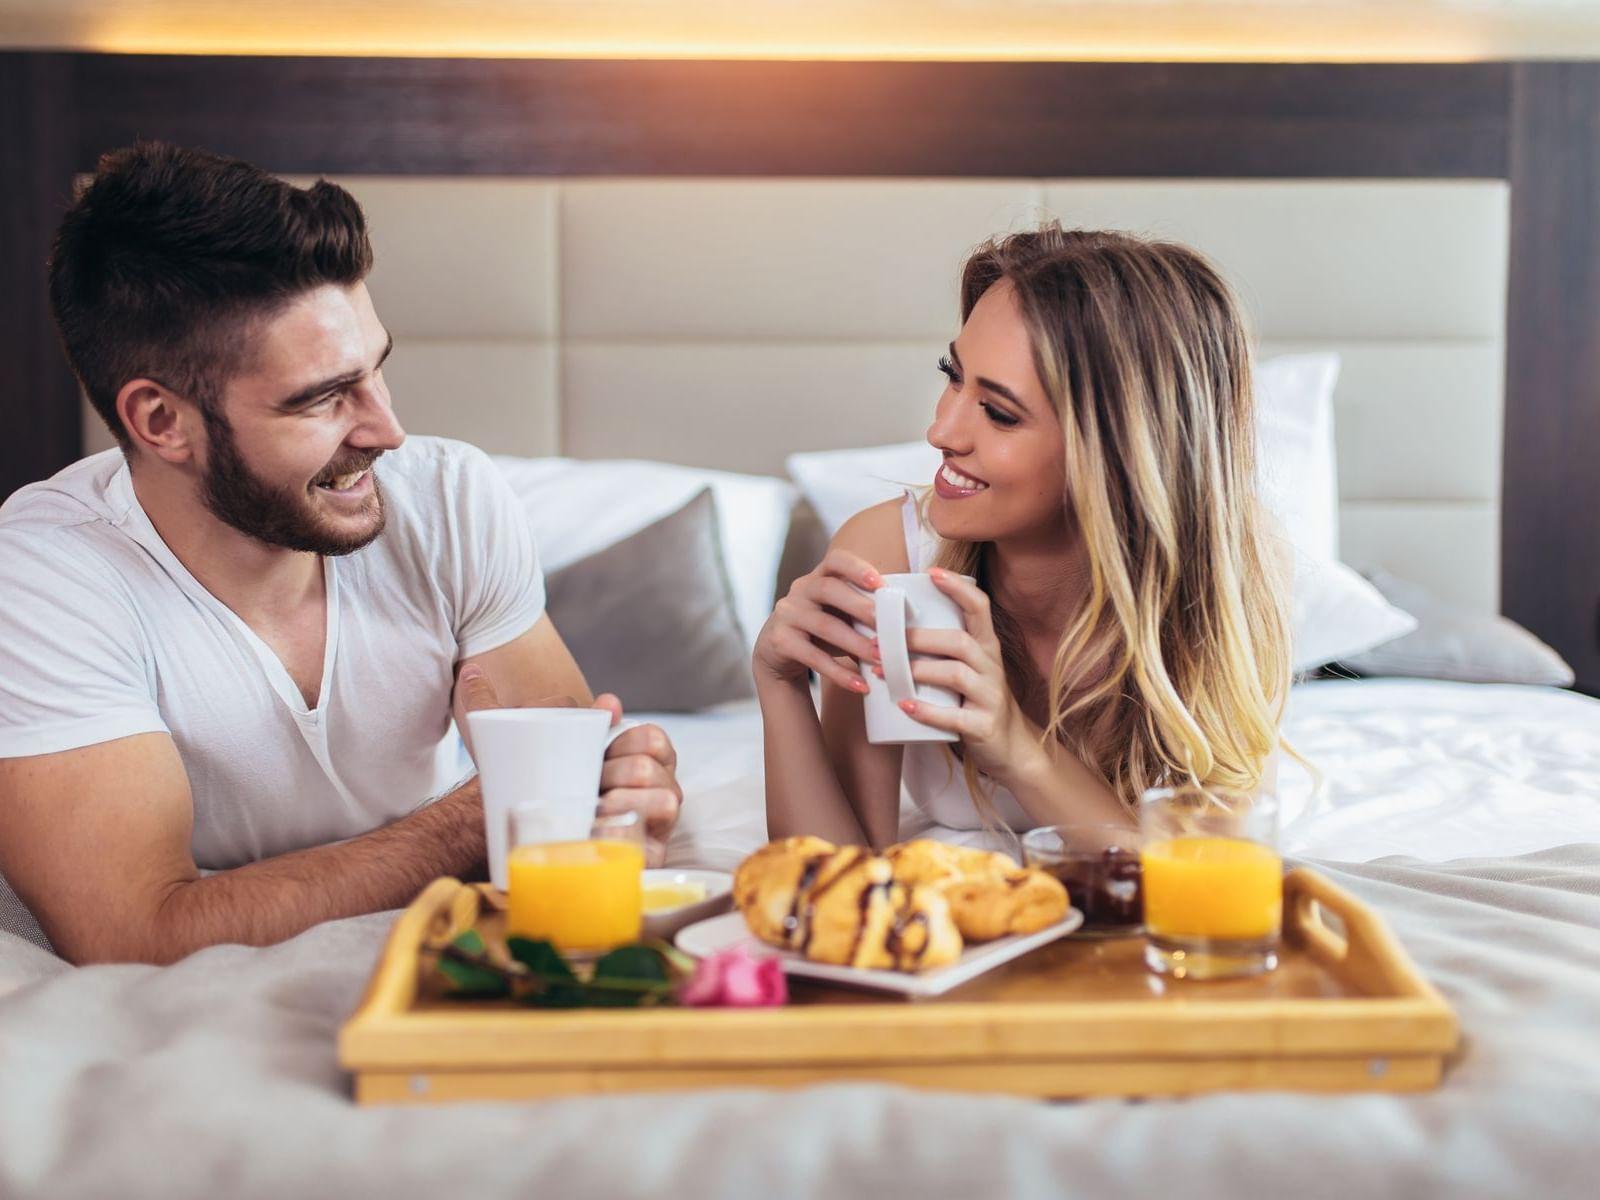 Couples having breakfast in bed